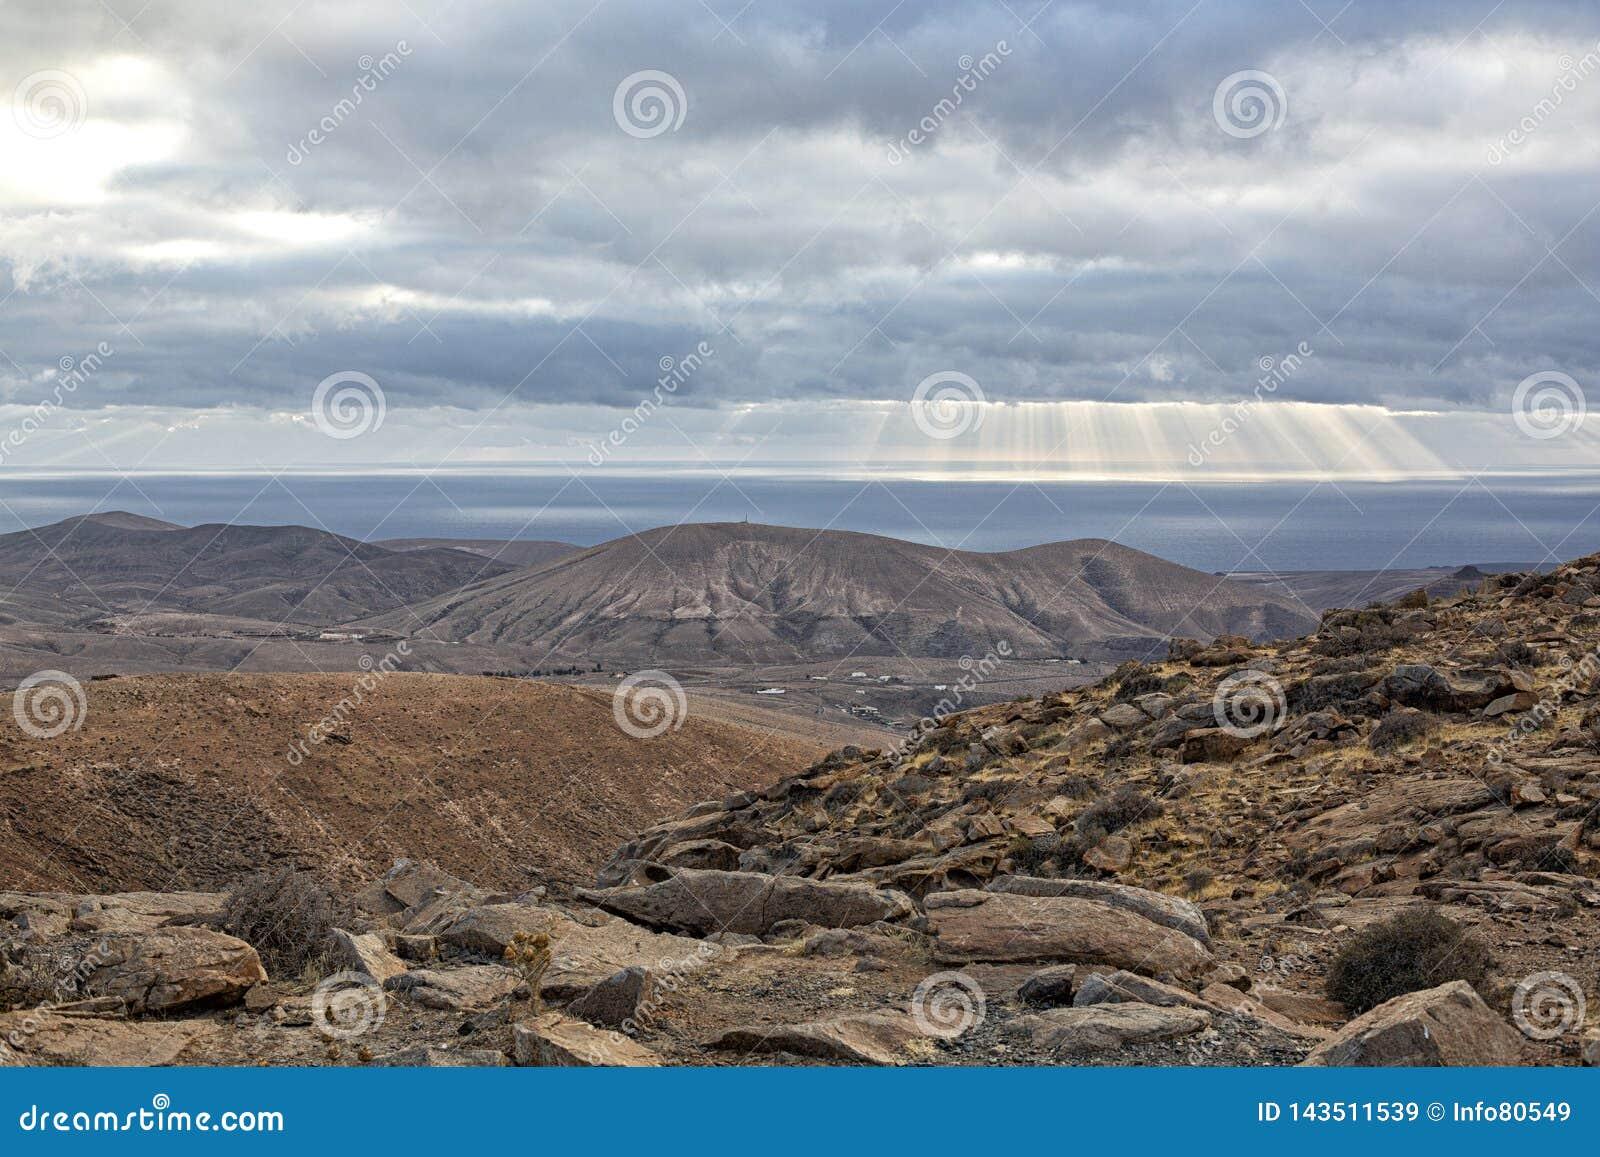 Mountain and sea landscape of Fuerteventura